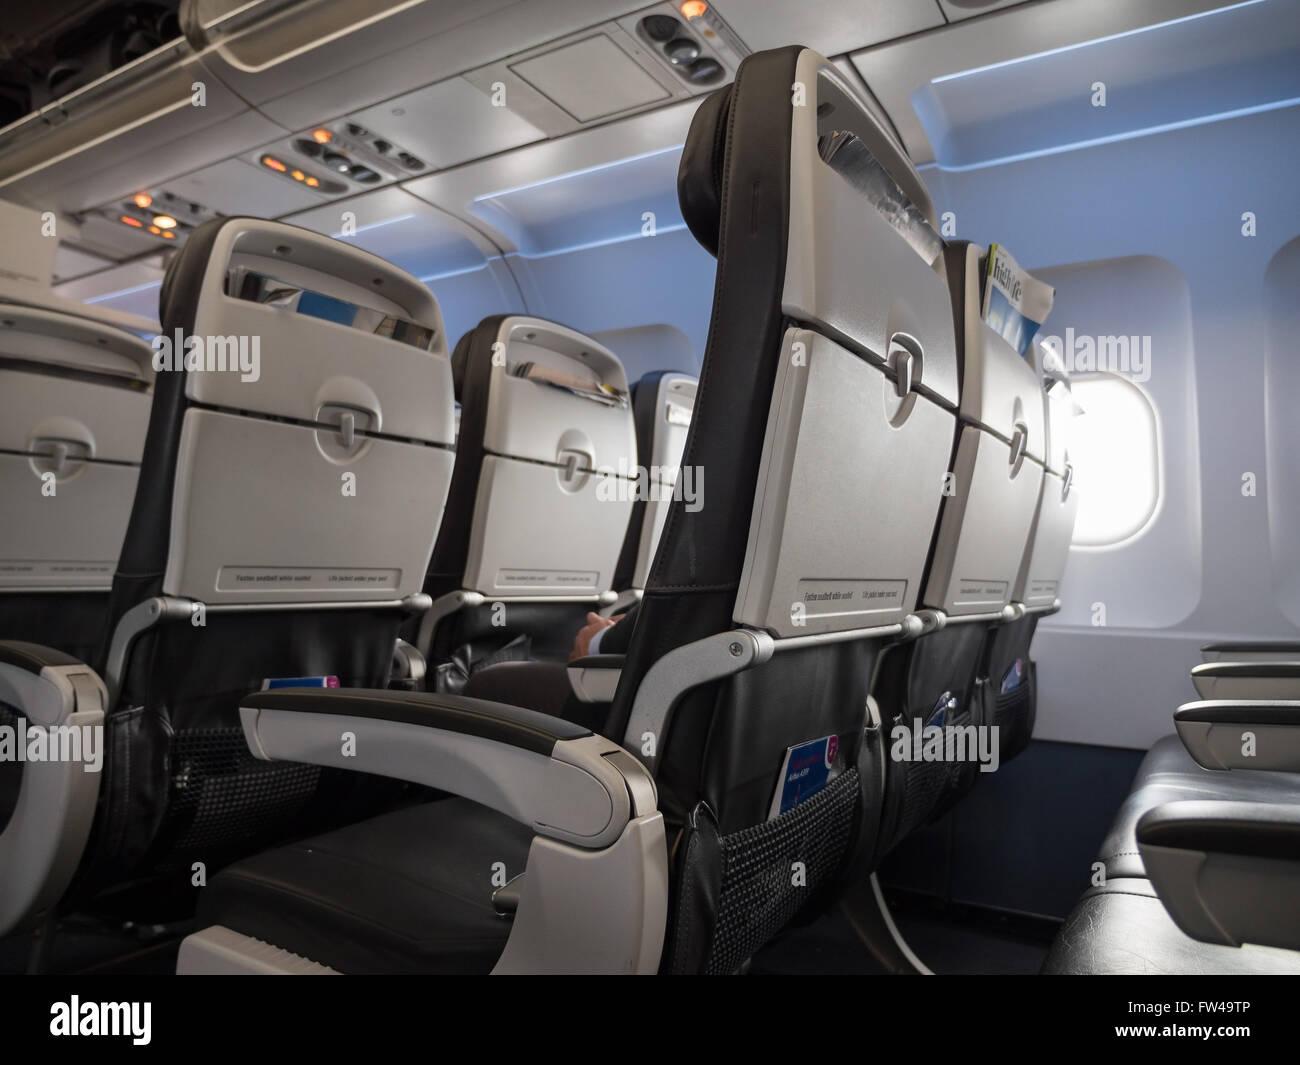 Empty economy seats on an aeroplane. - Stock Image